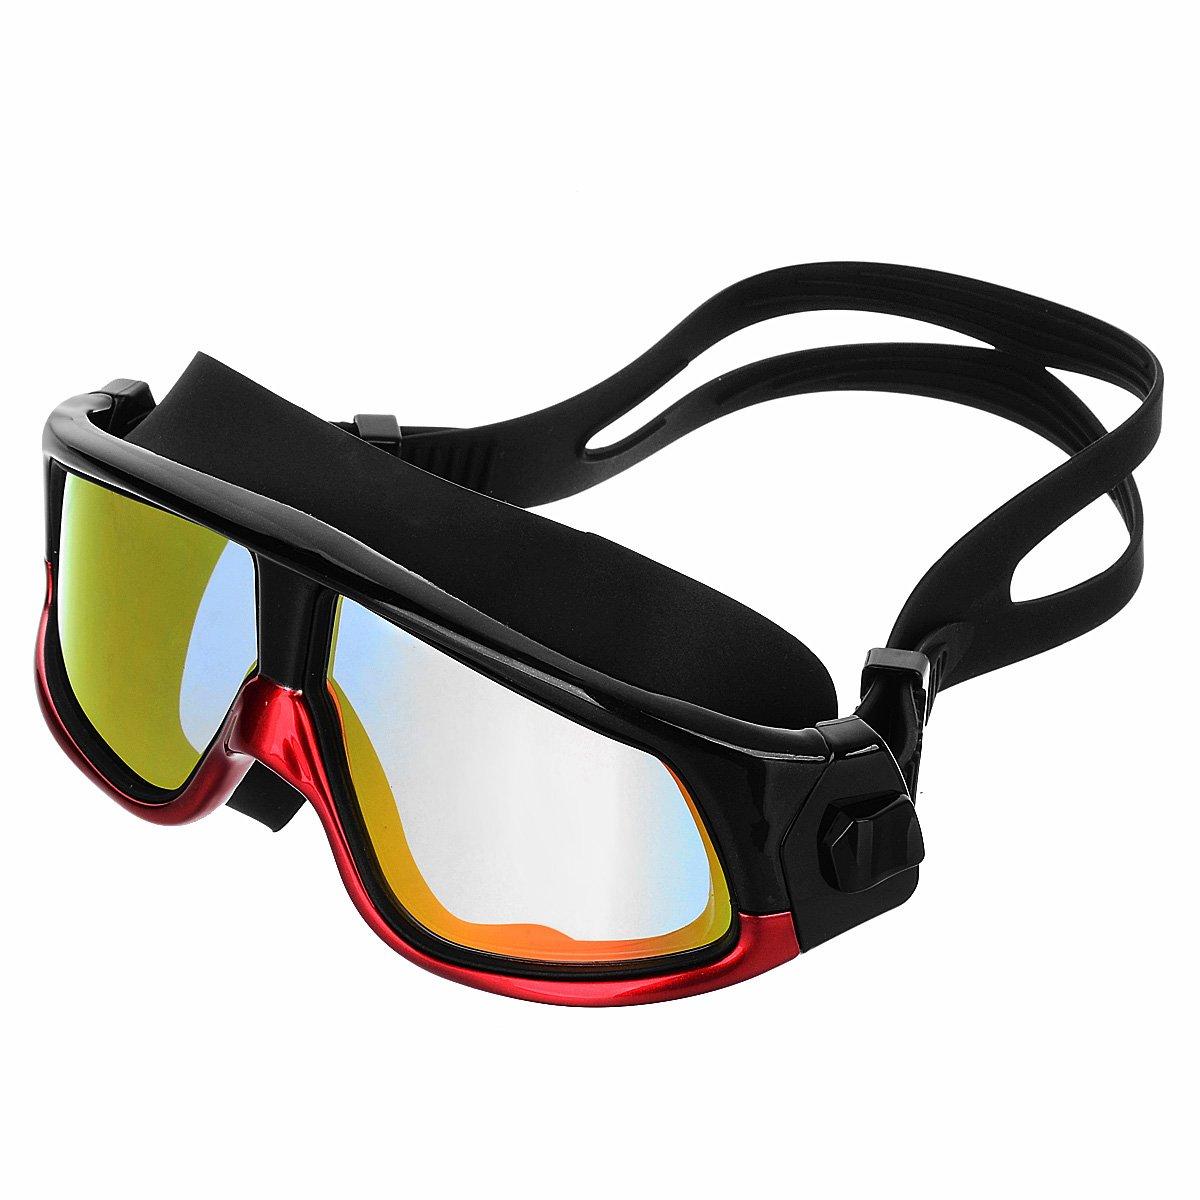 AVOLUTION Fashionable HD Antifogging Large Frame Swimming Goggles Dark red + Black